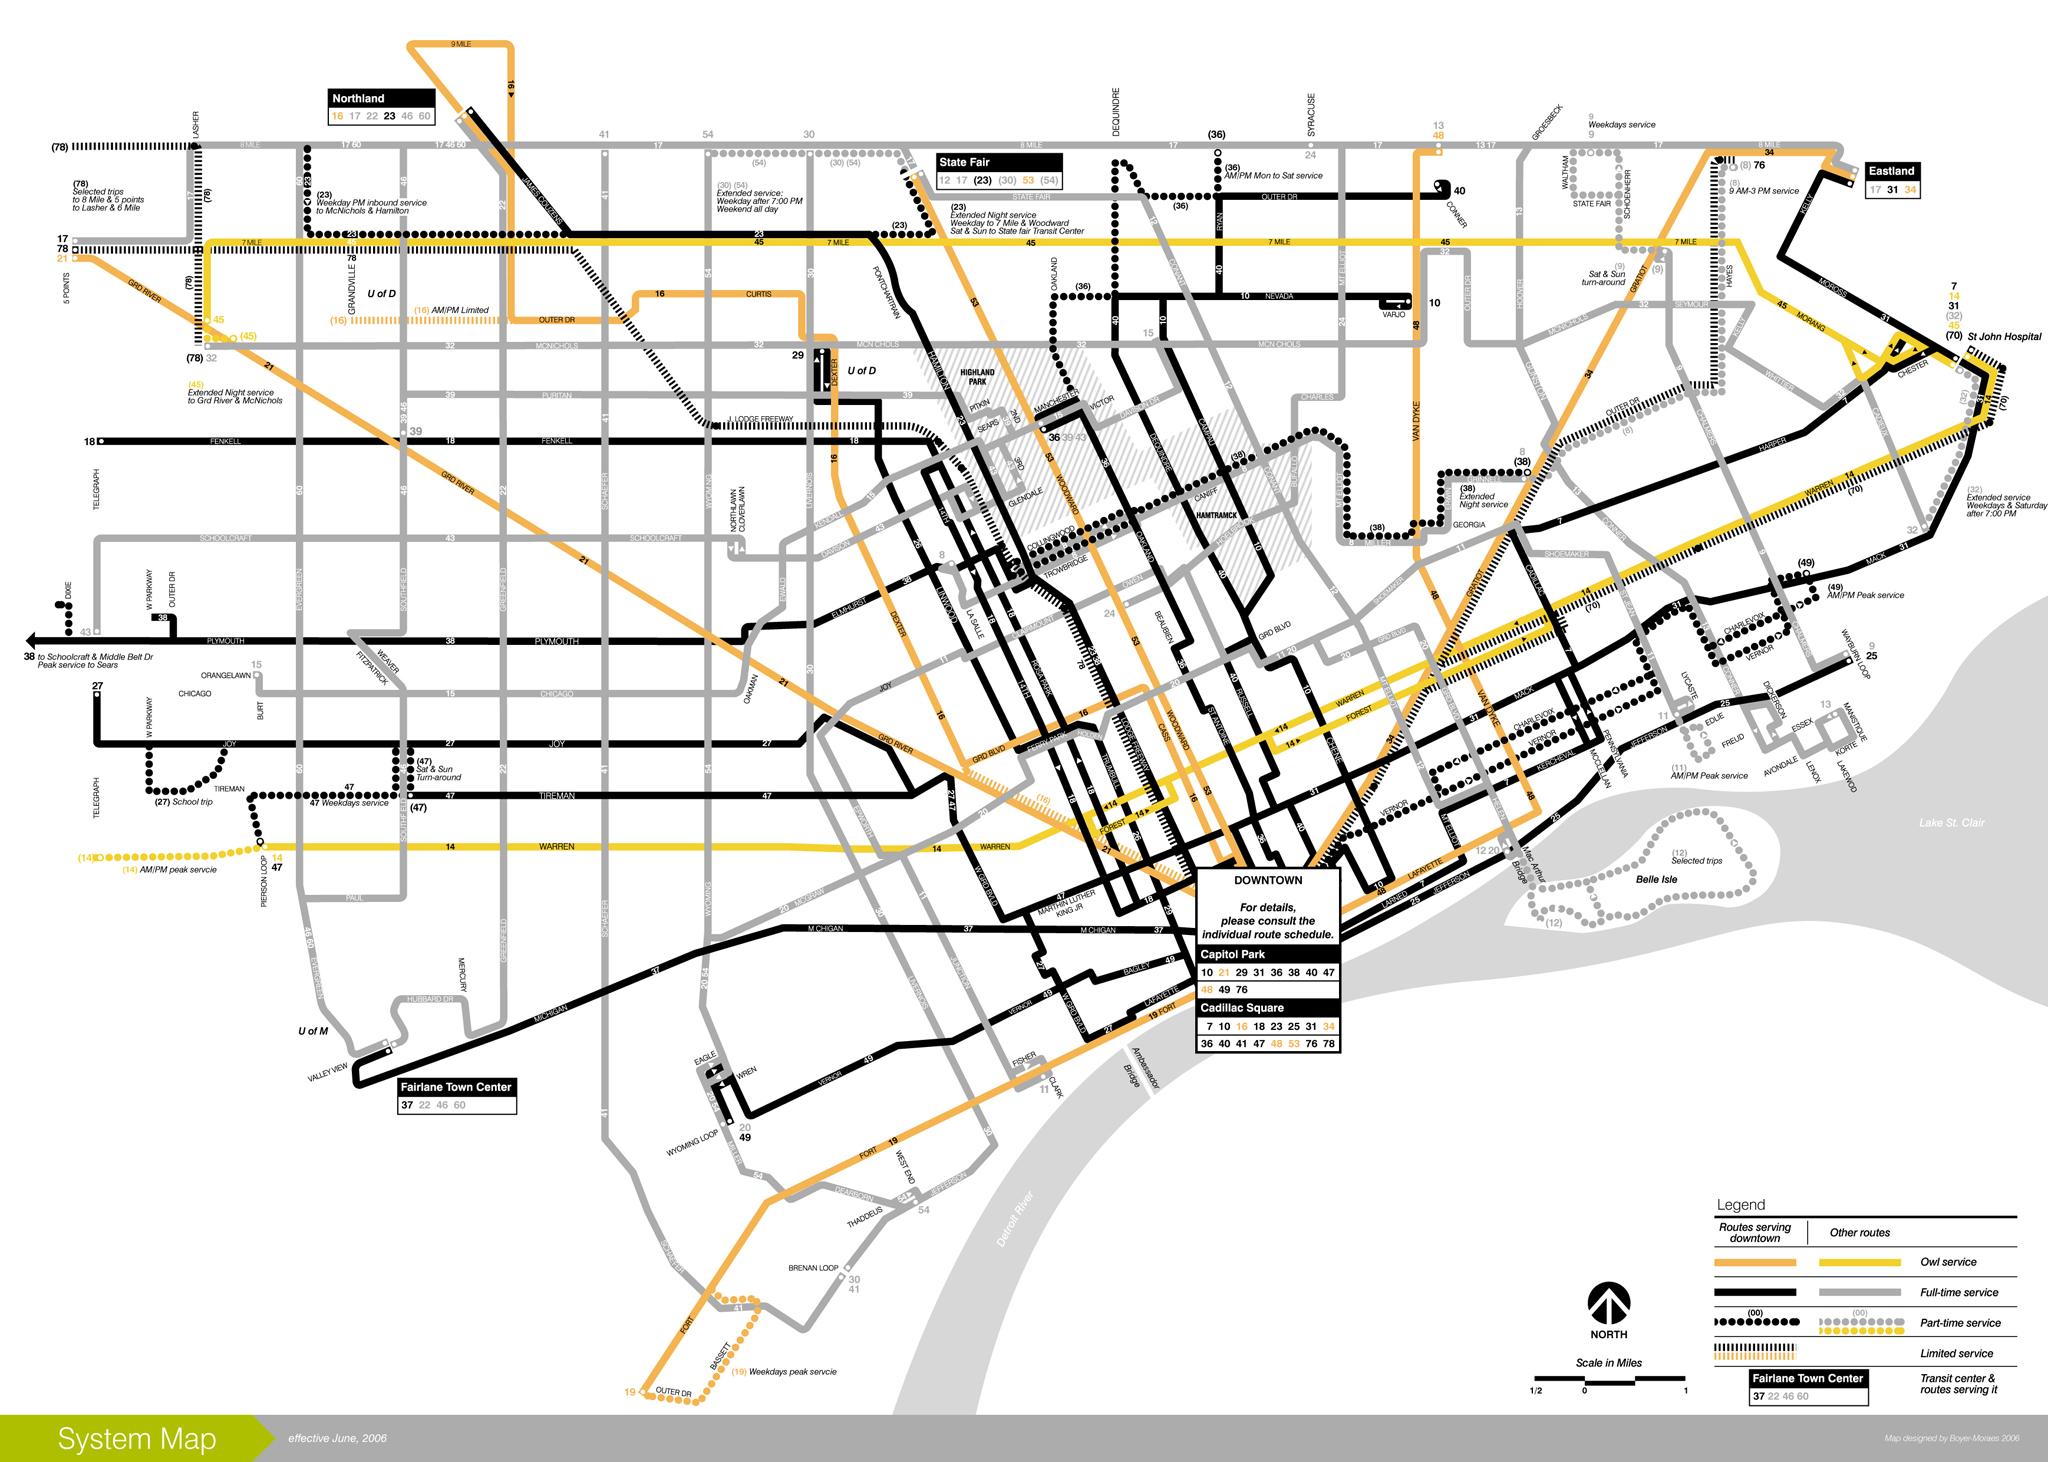 DDOT 2006 System Map - Detroit Michigan • mappery